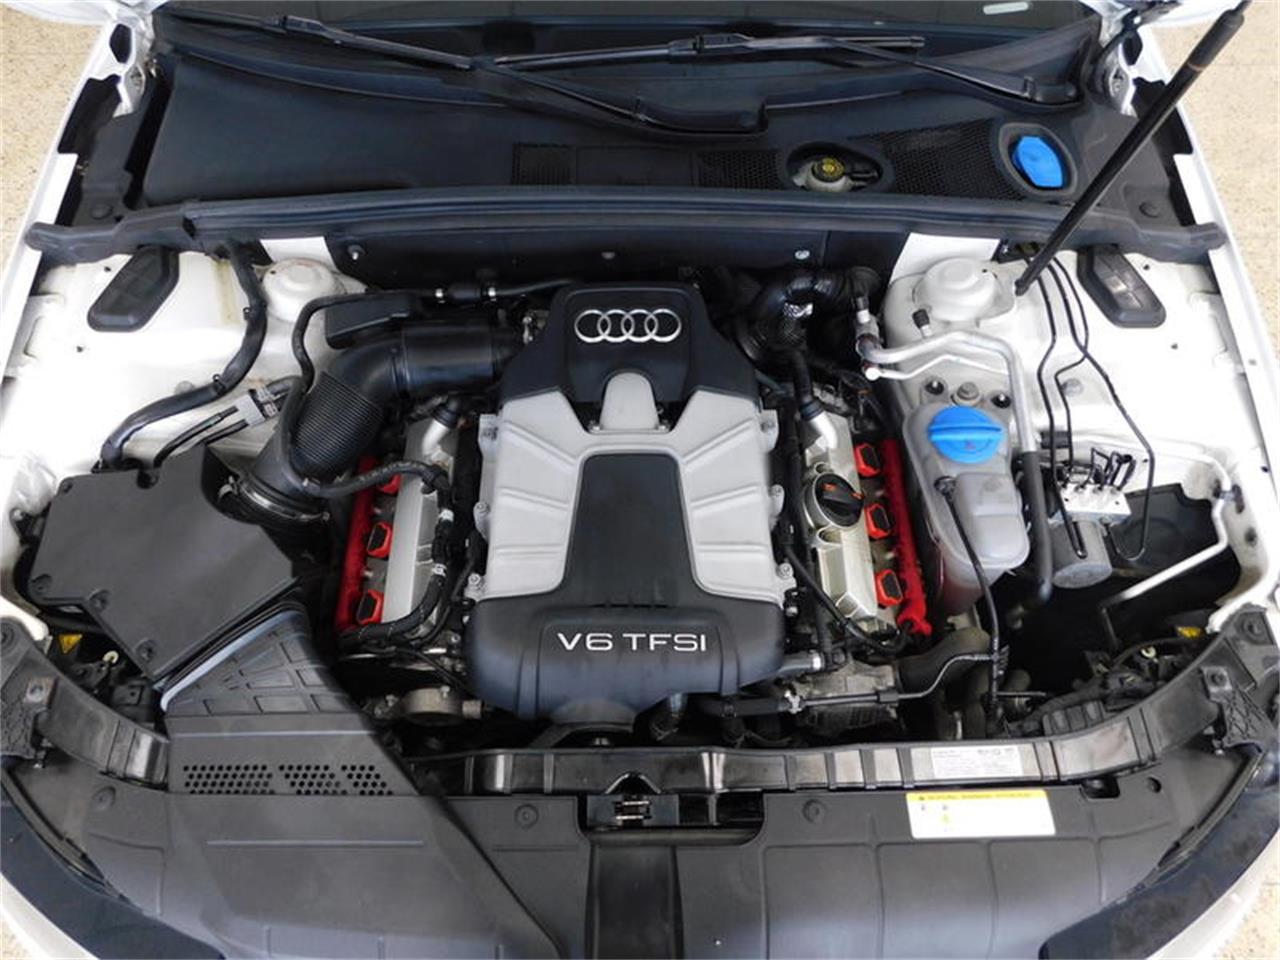 2013 Audi S4 (CC-1320964) for sale in Hamburg, New York